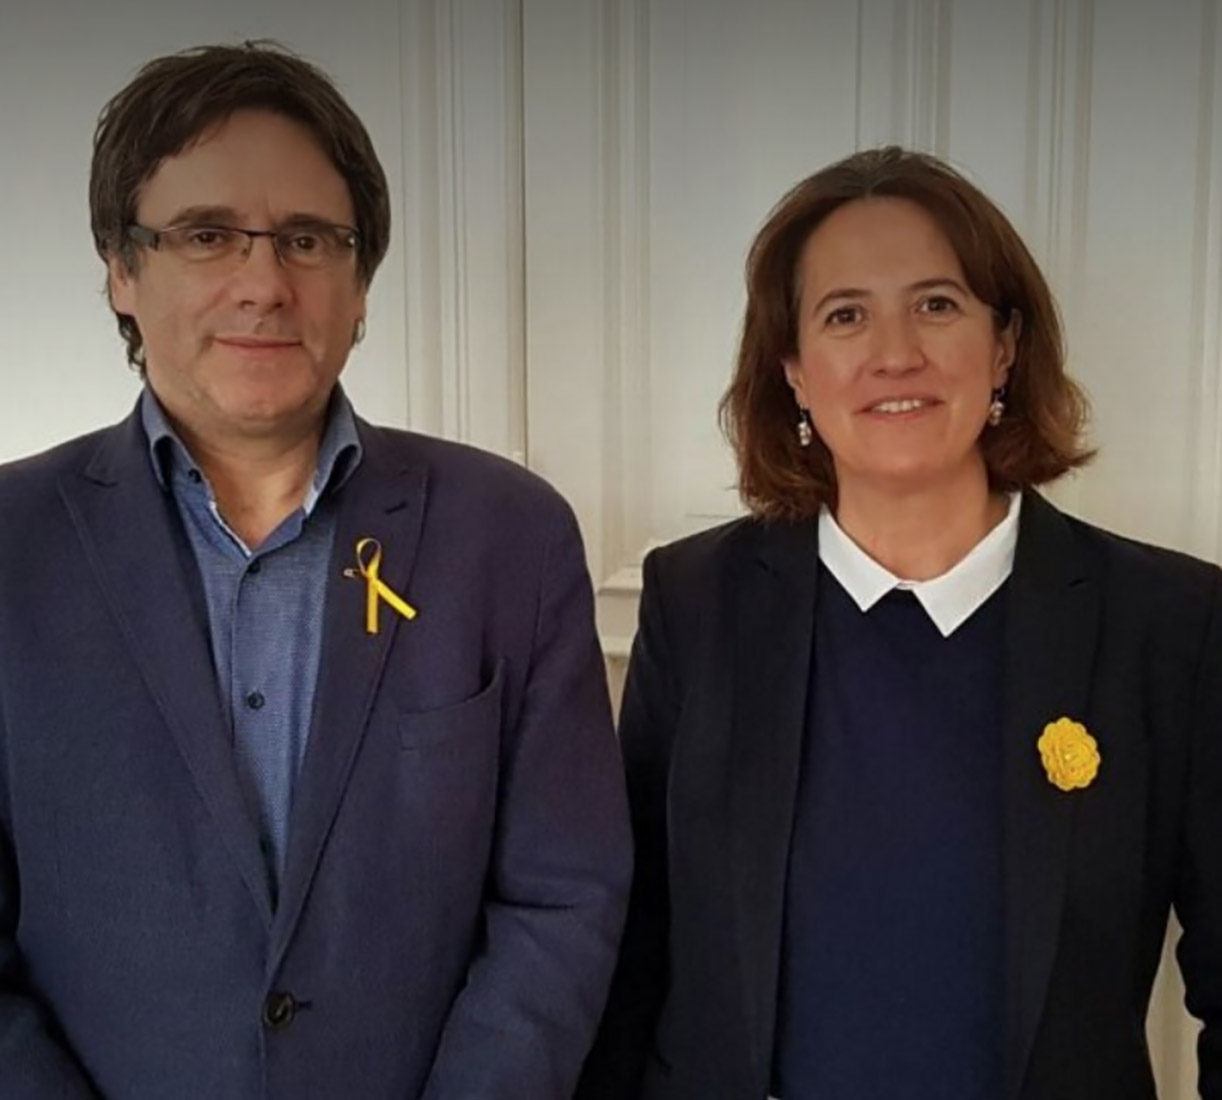 Carles Puigdemont i Elisenda Paluzie, en una imatge d'arxiu